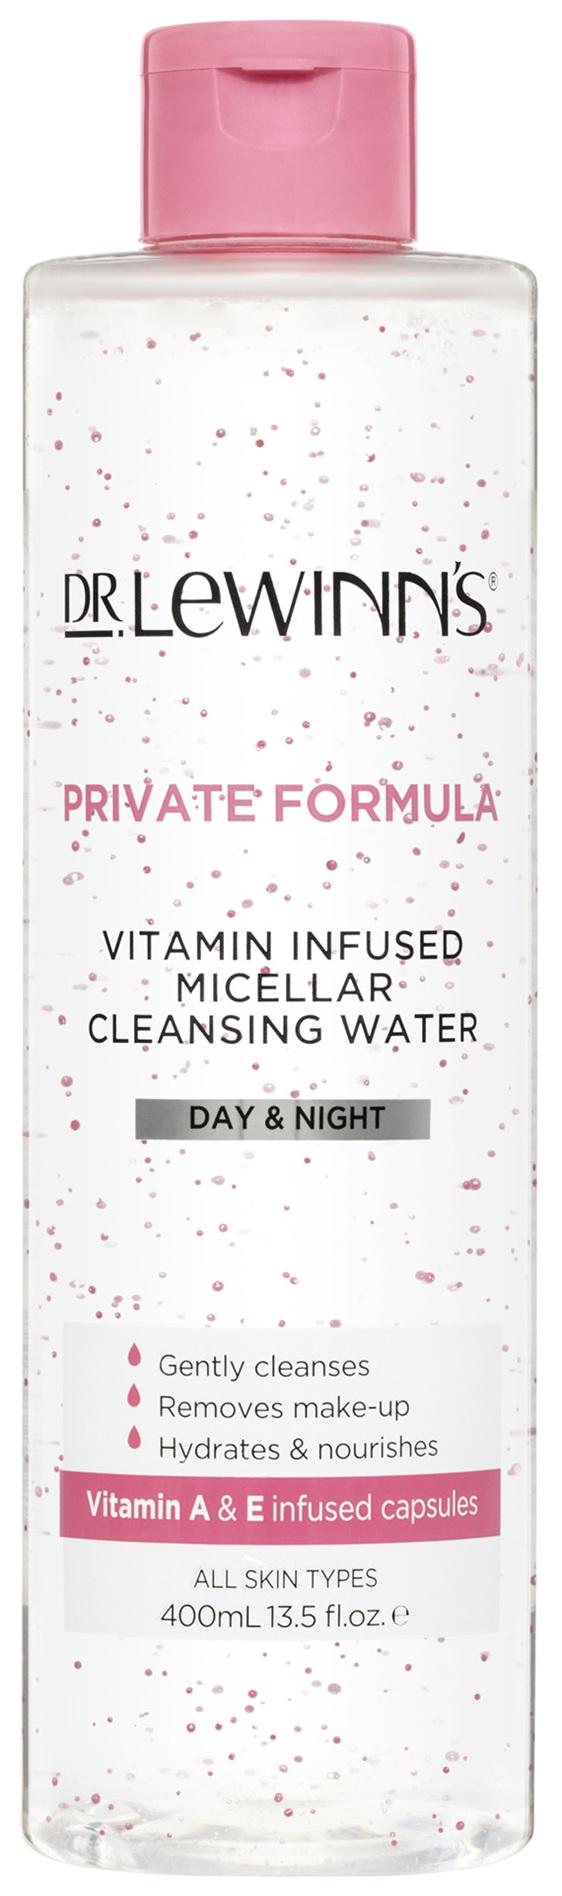 DLW PF Vitamin Infused Micellar Water 400ml